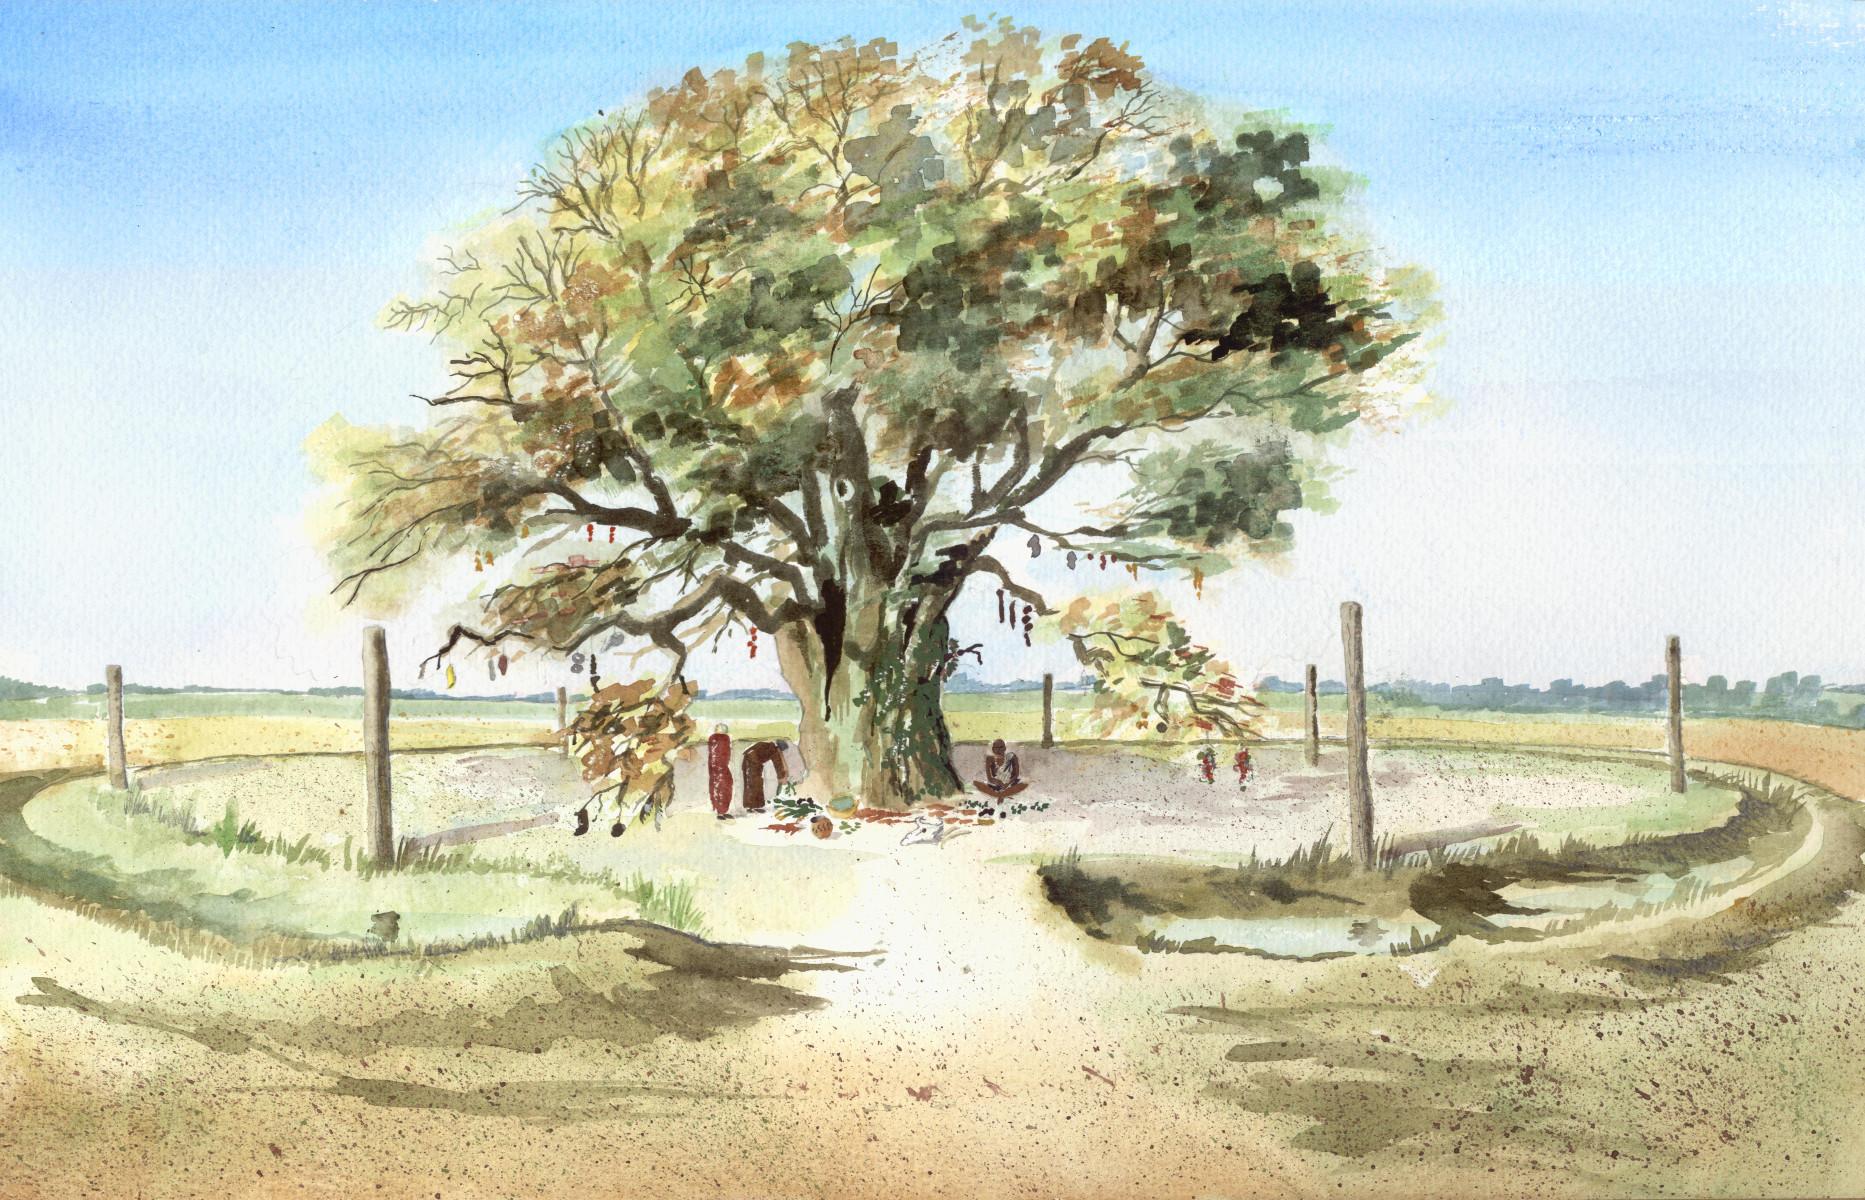 Reconstruction of henge with sacred oak tree.